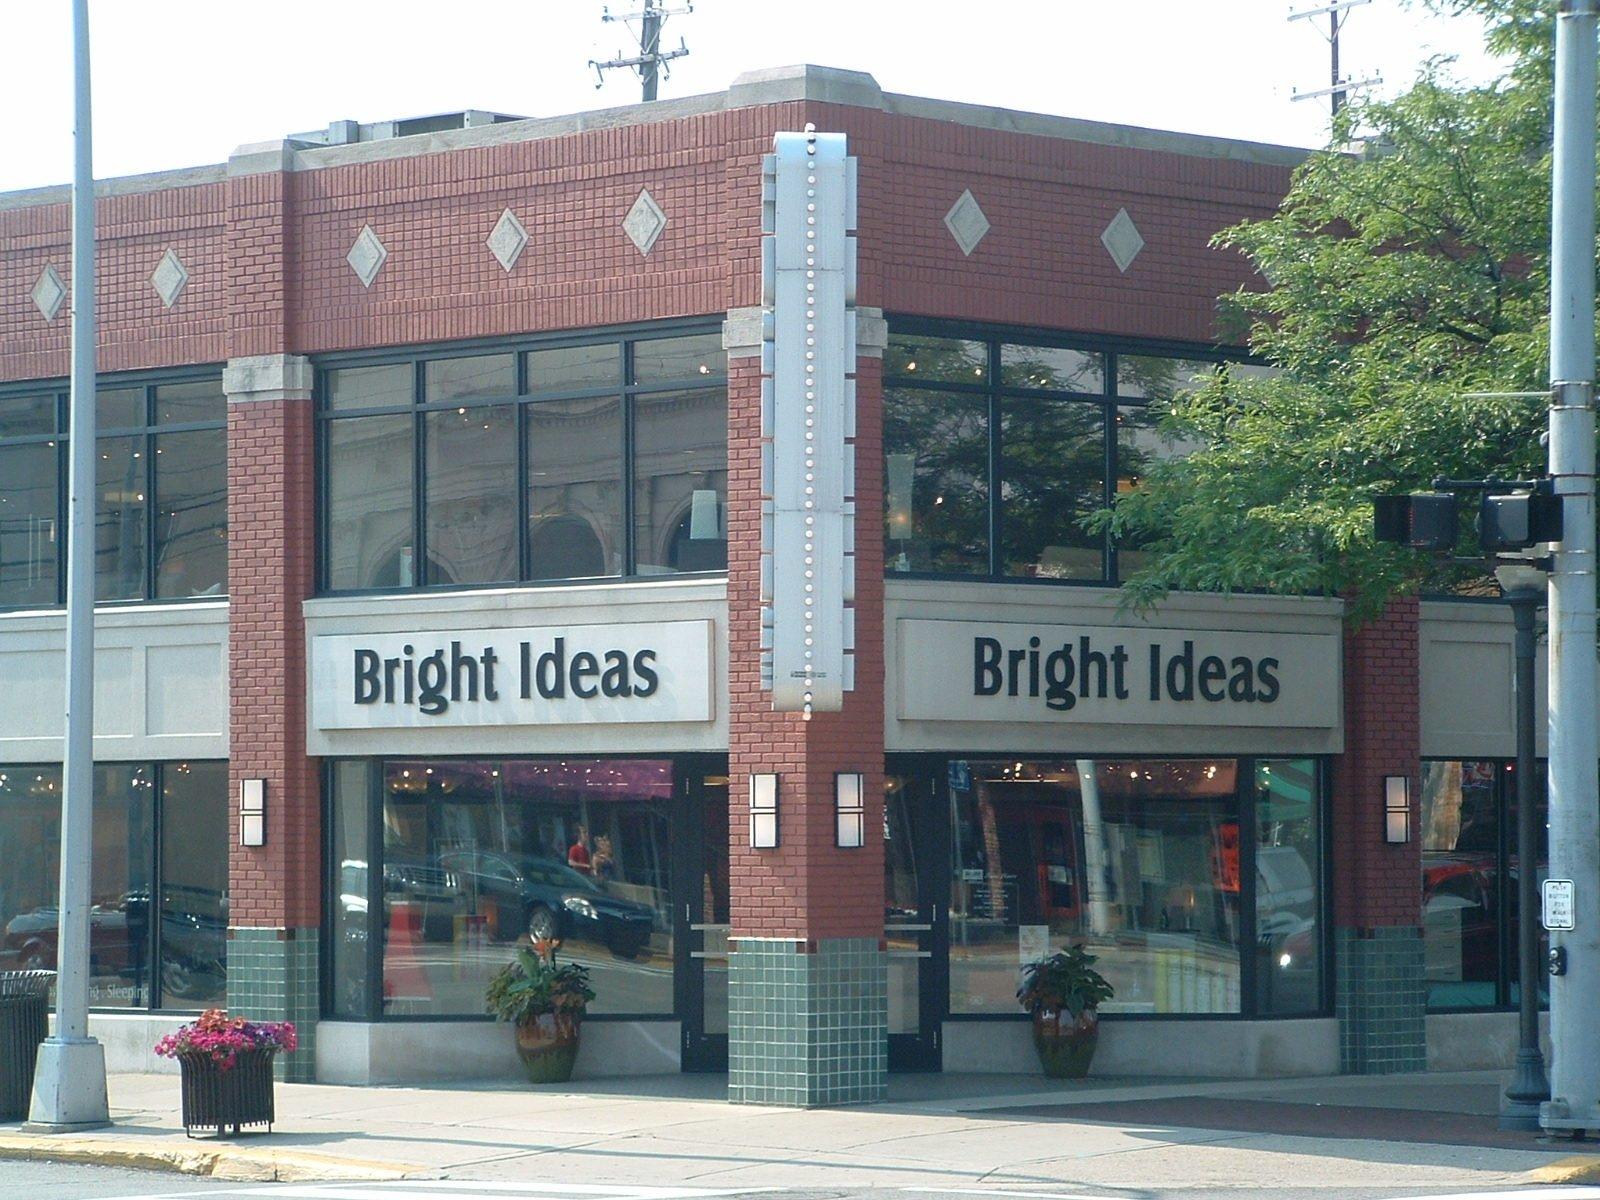 10 Unique Bright Ideas Royal Oak Mi bright ideas furniture to buy former haberman fabrics building in 1 2021